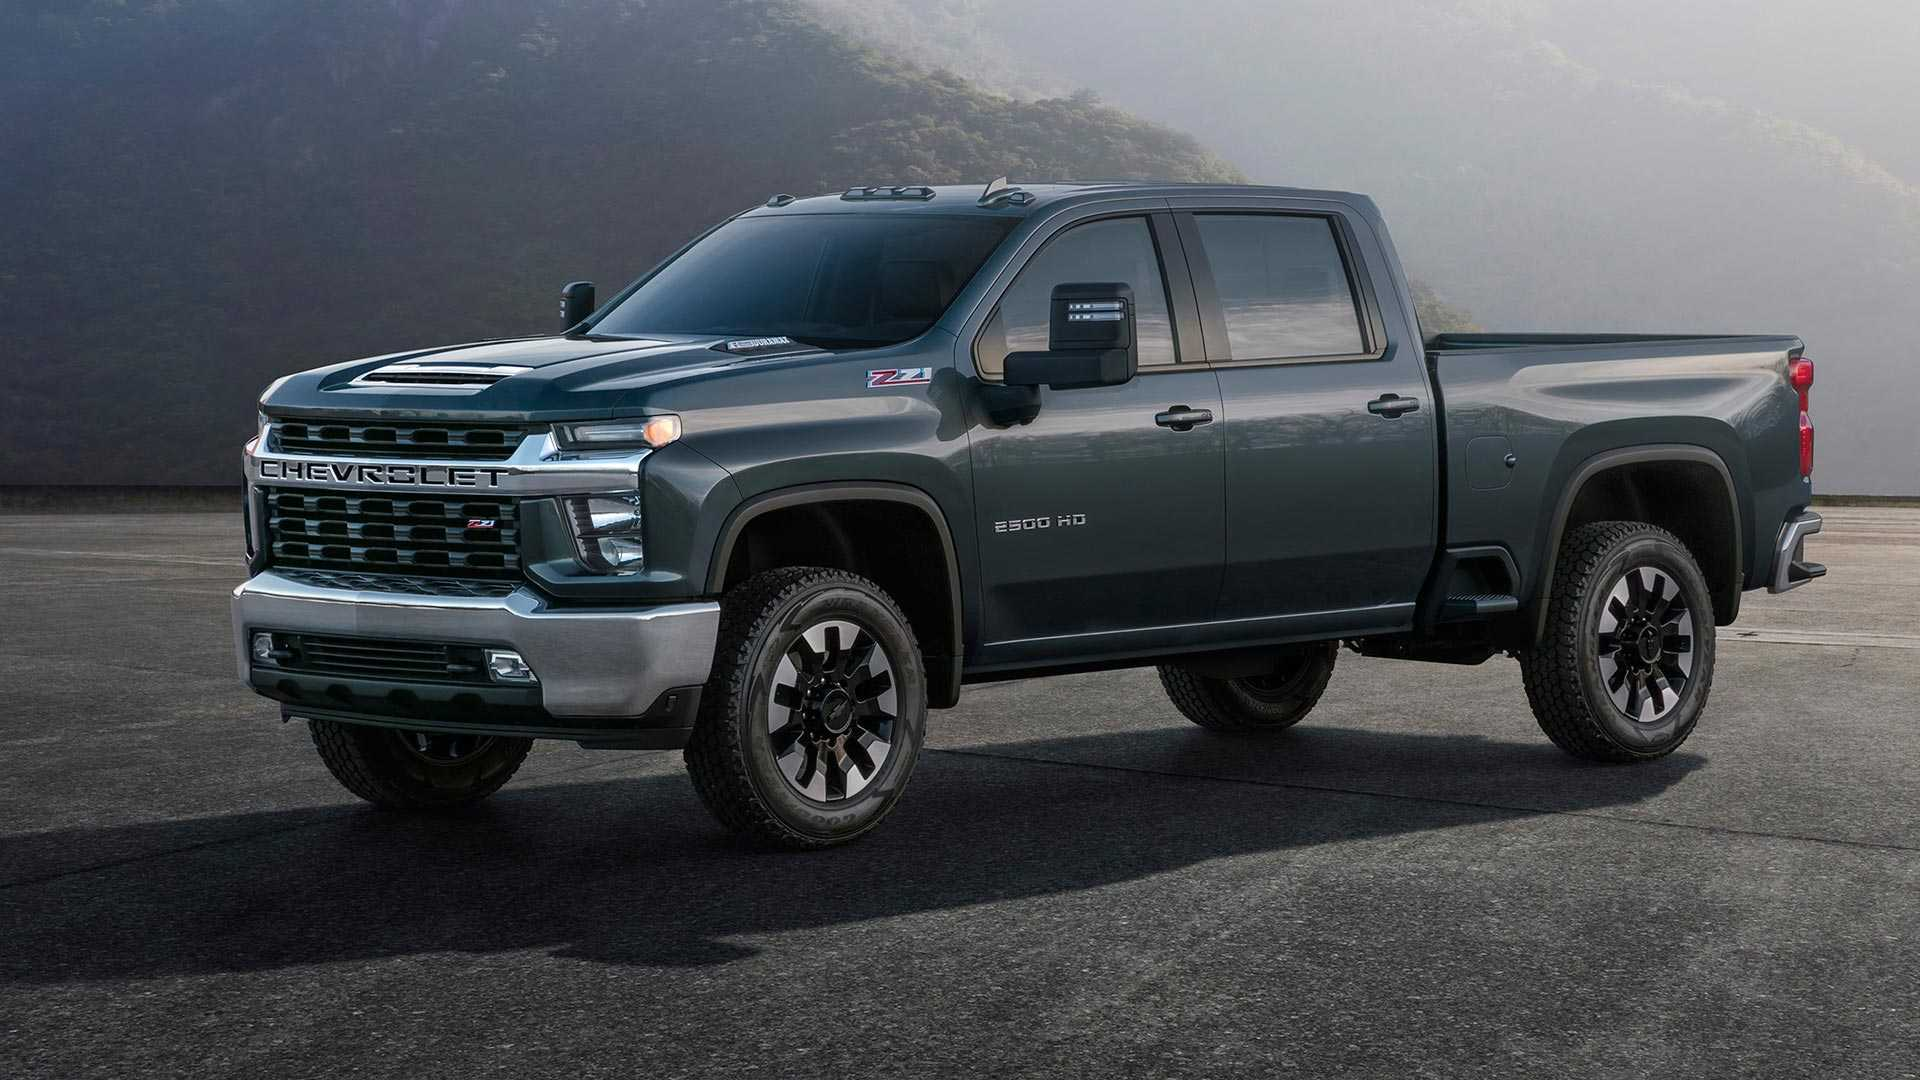 2019 Chevrolet Silverado HD resmi görüntüleri